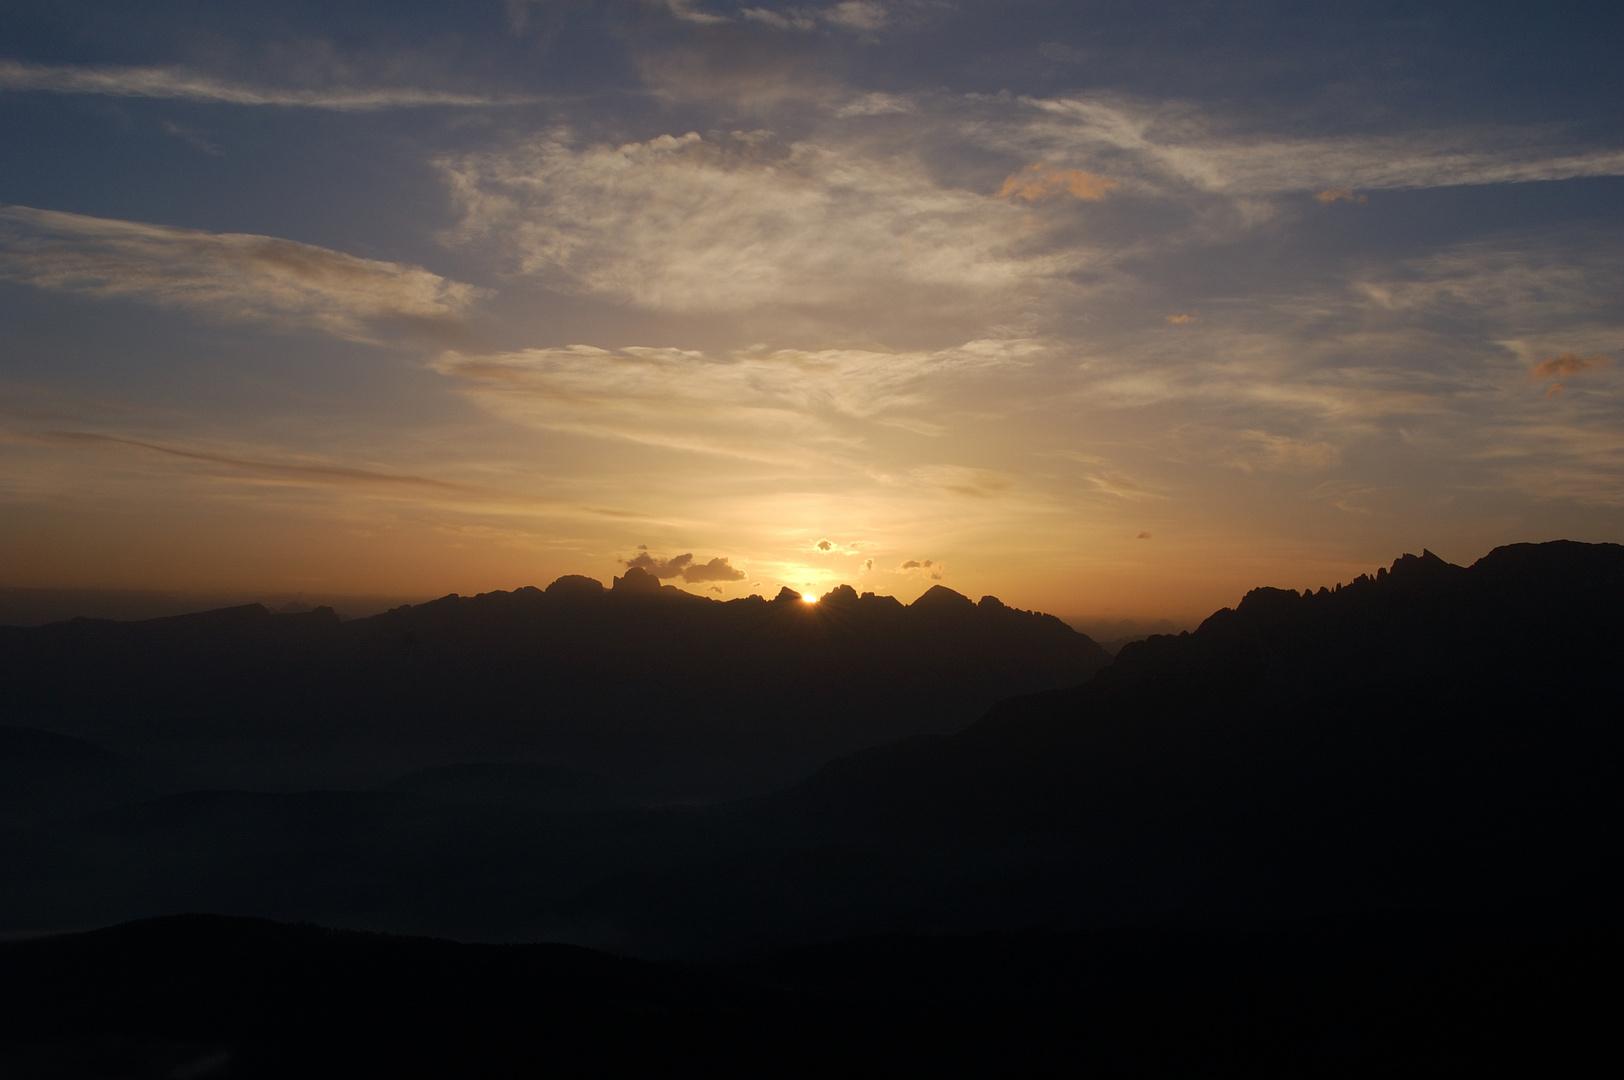 Sonnenaufgang in unseren Bergen